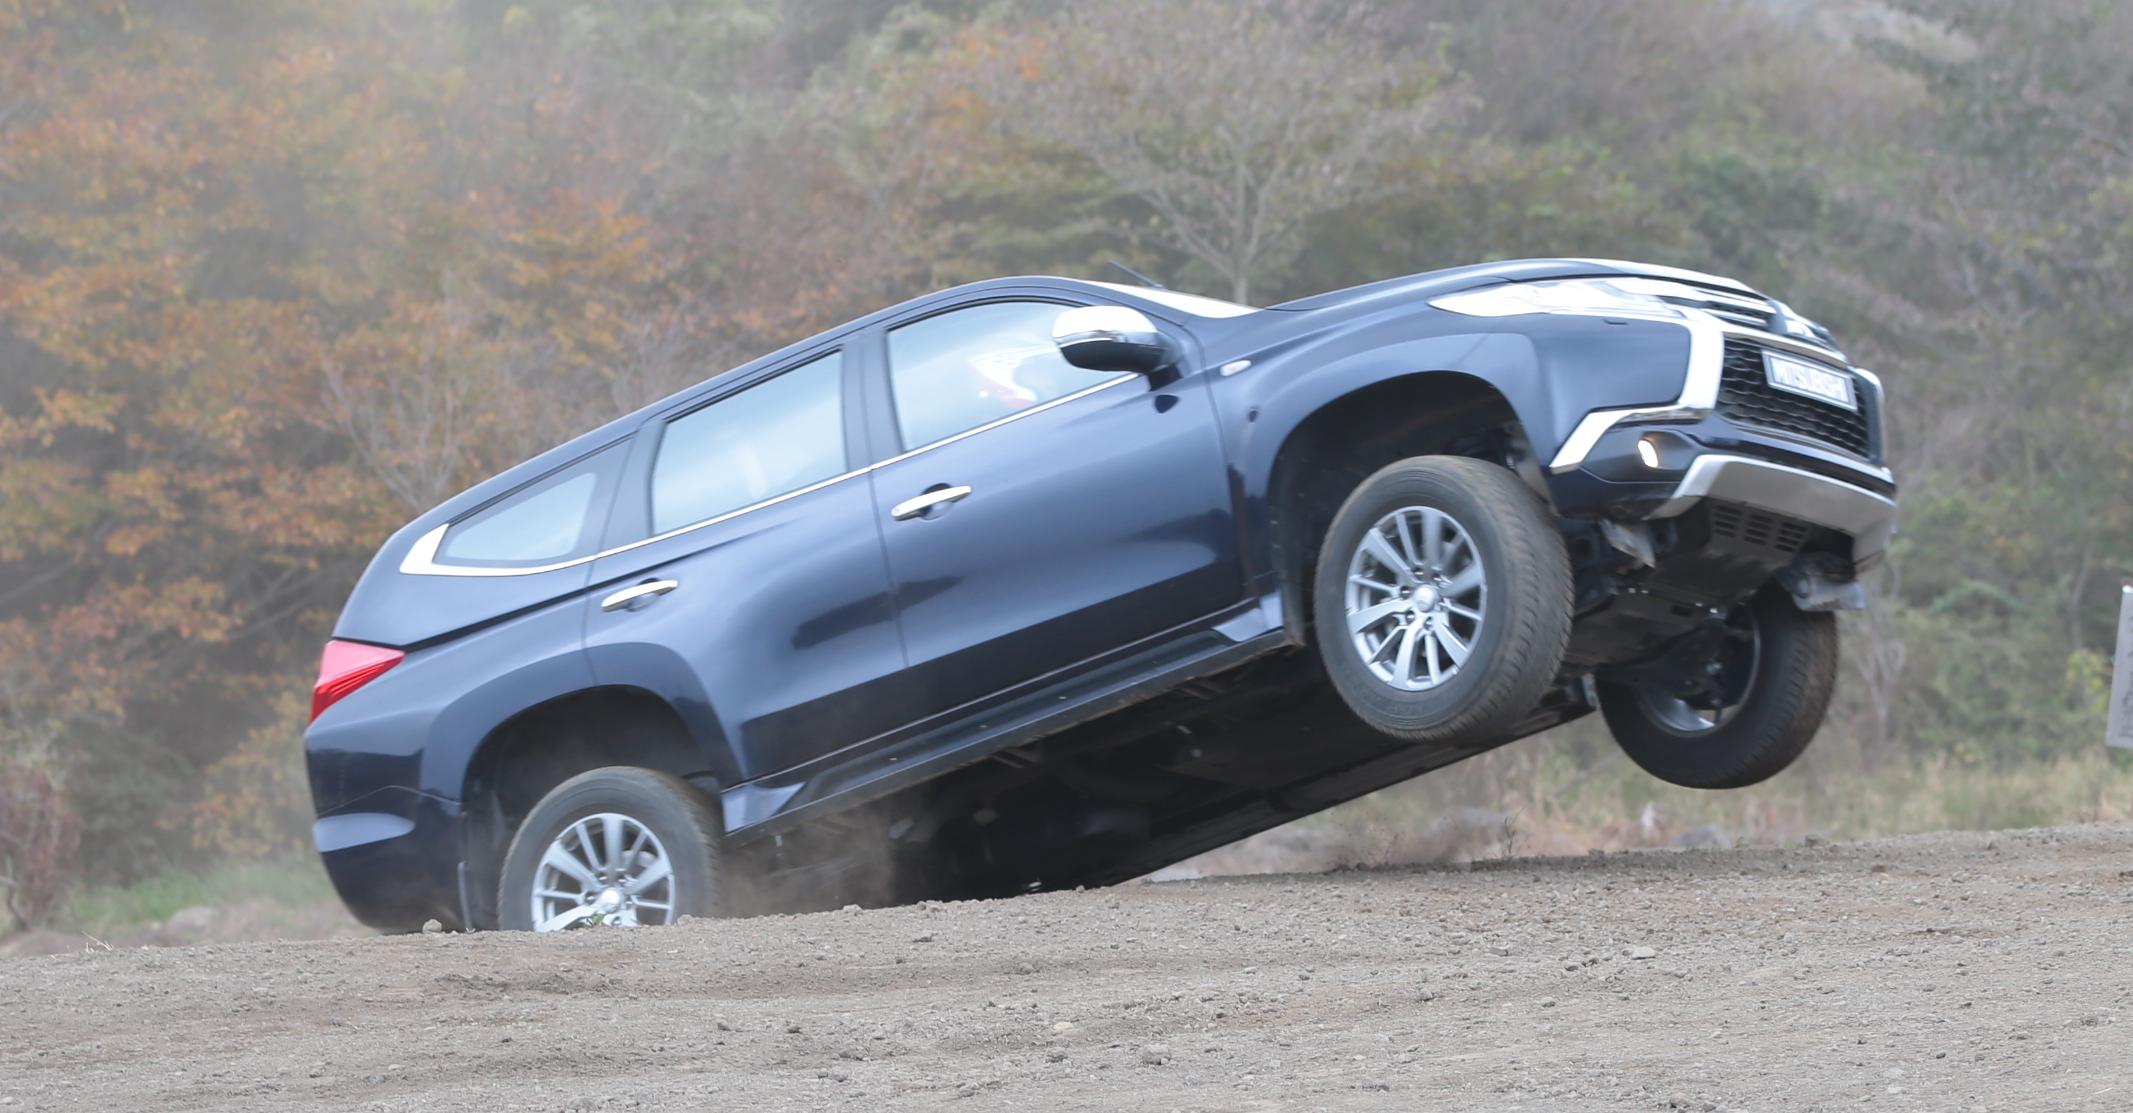 Mitsubishi Pajero Sport Review: Quick Drive